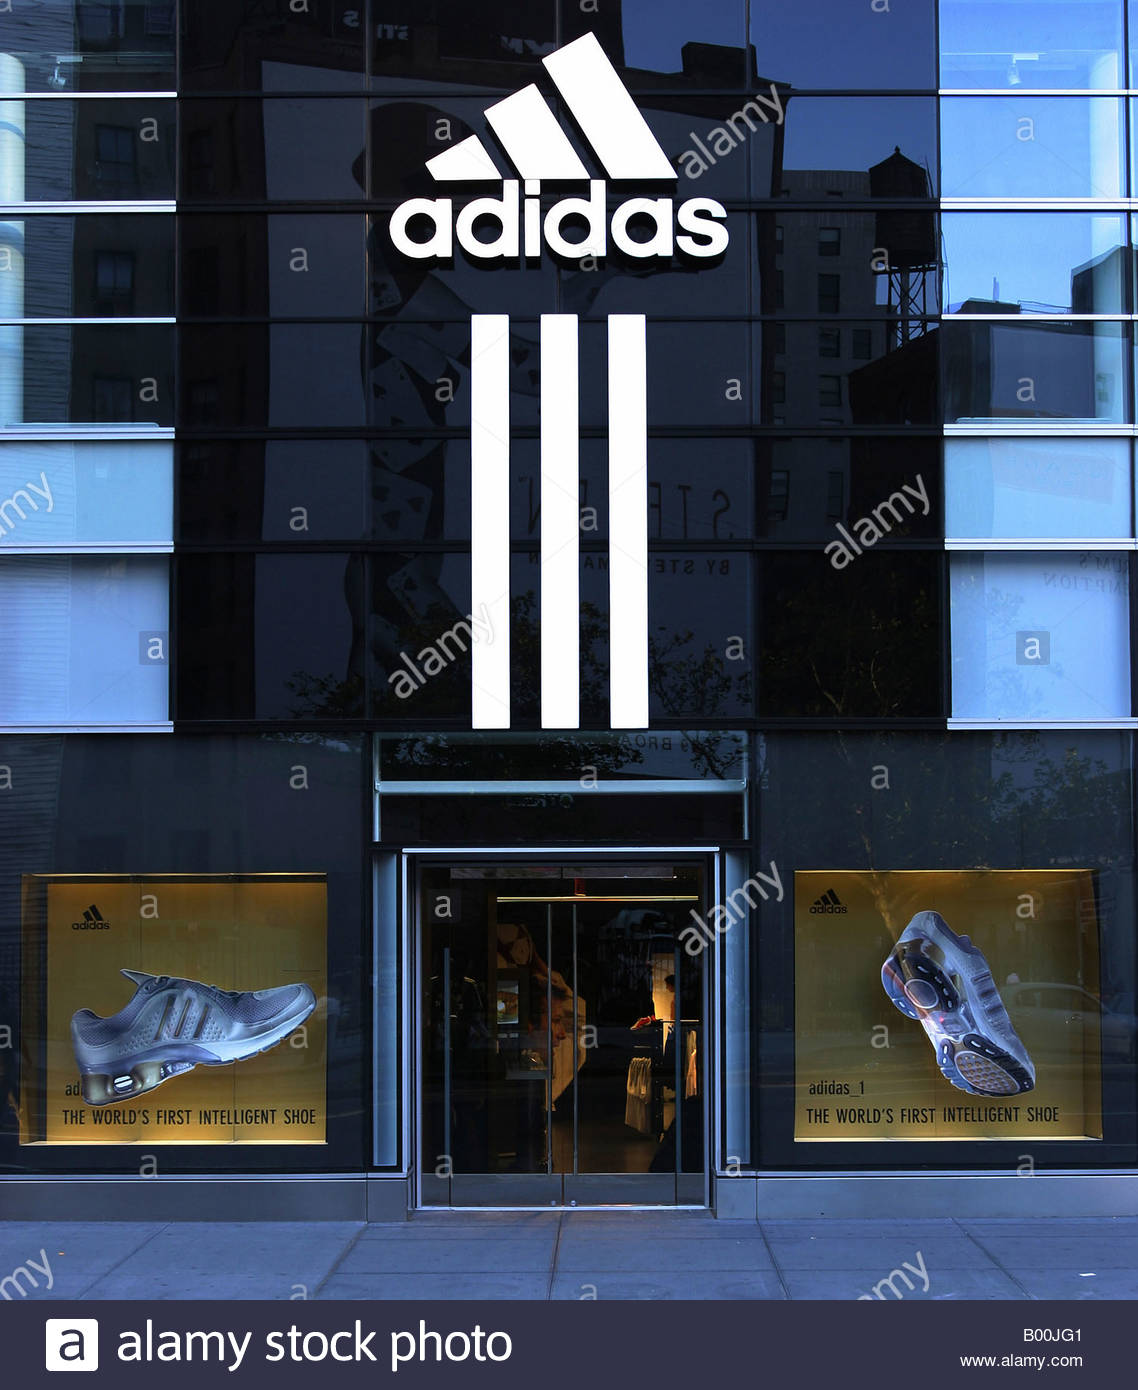 adidas usa shop